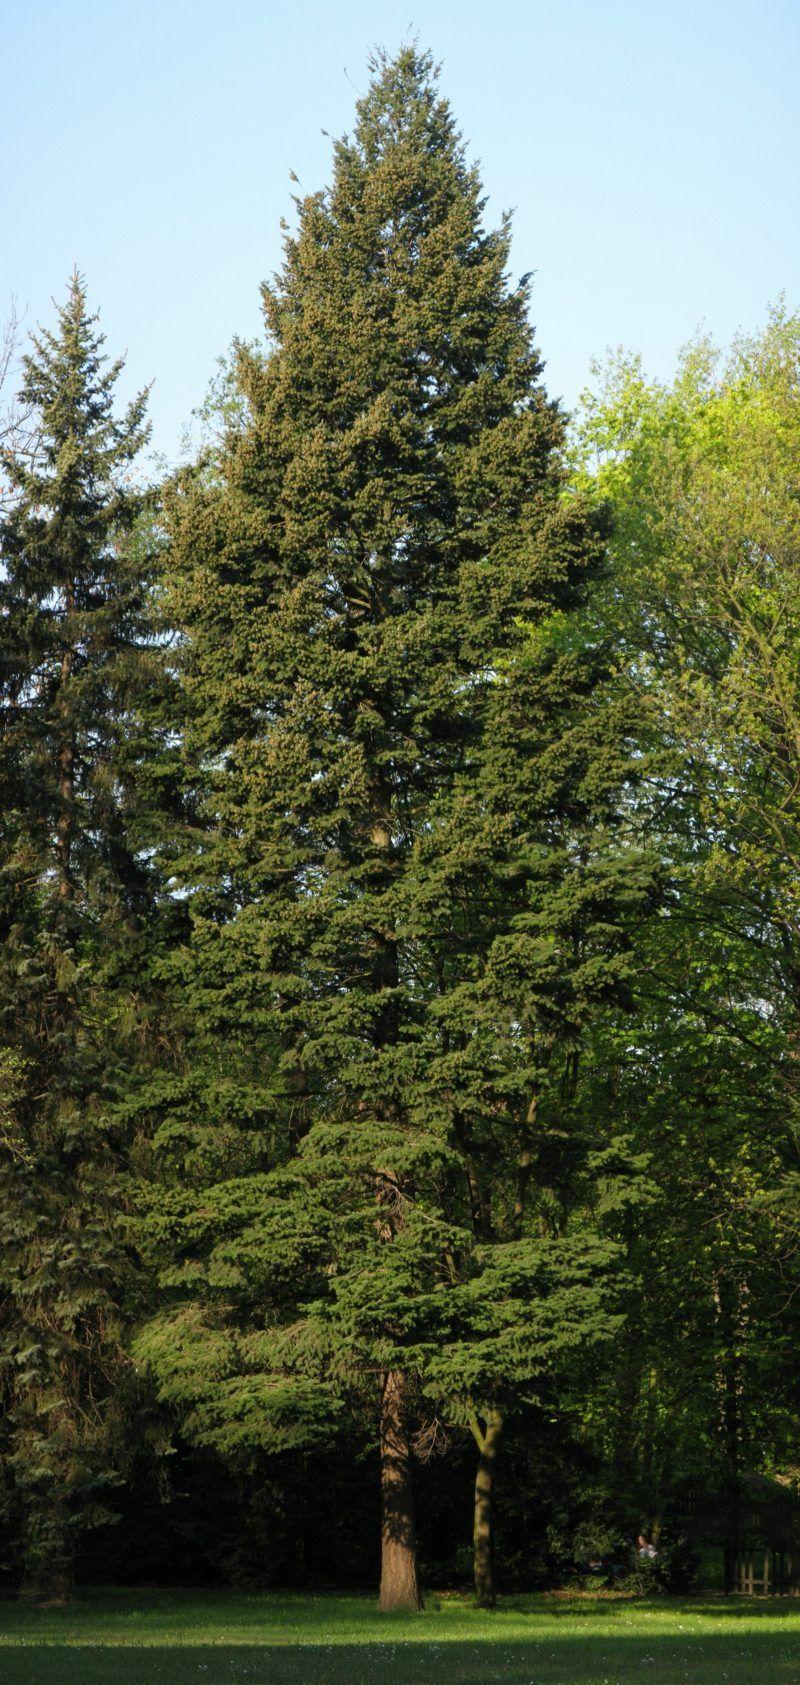 Immergrune Baume Differenzierung Garten Evergreen Evergreen